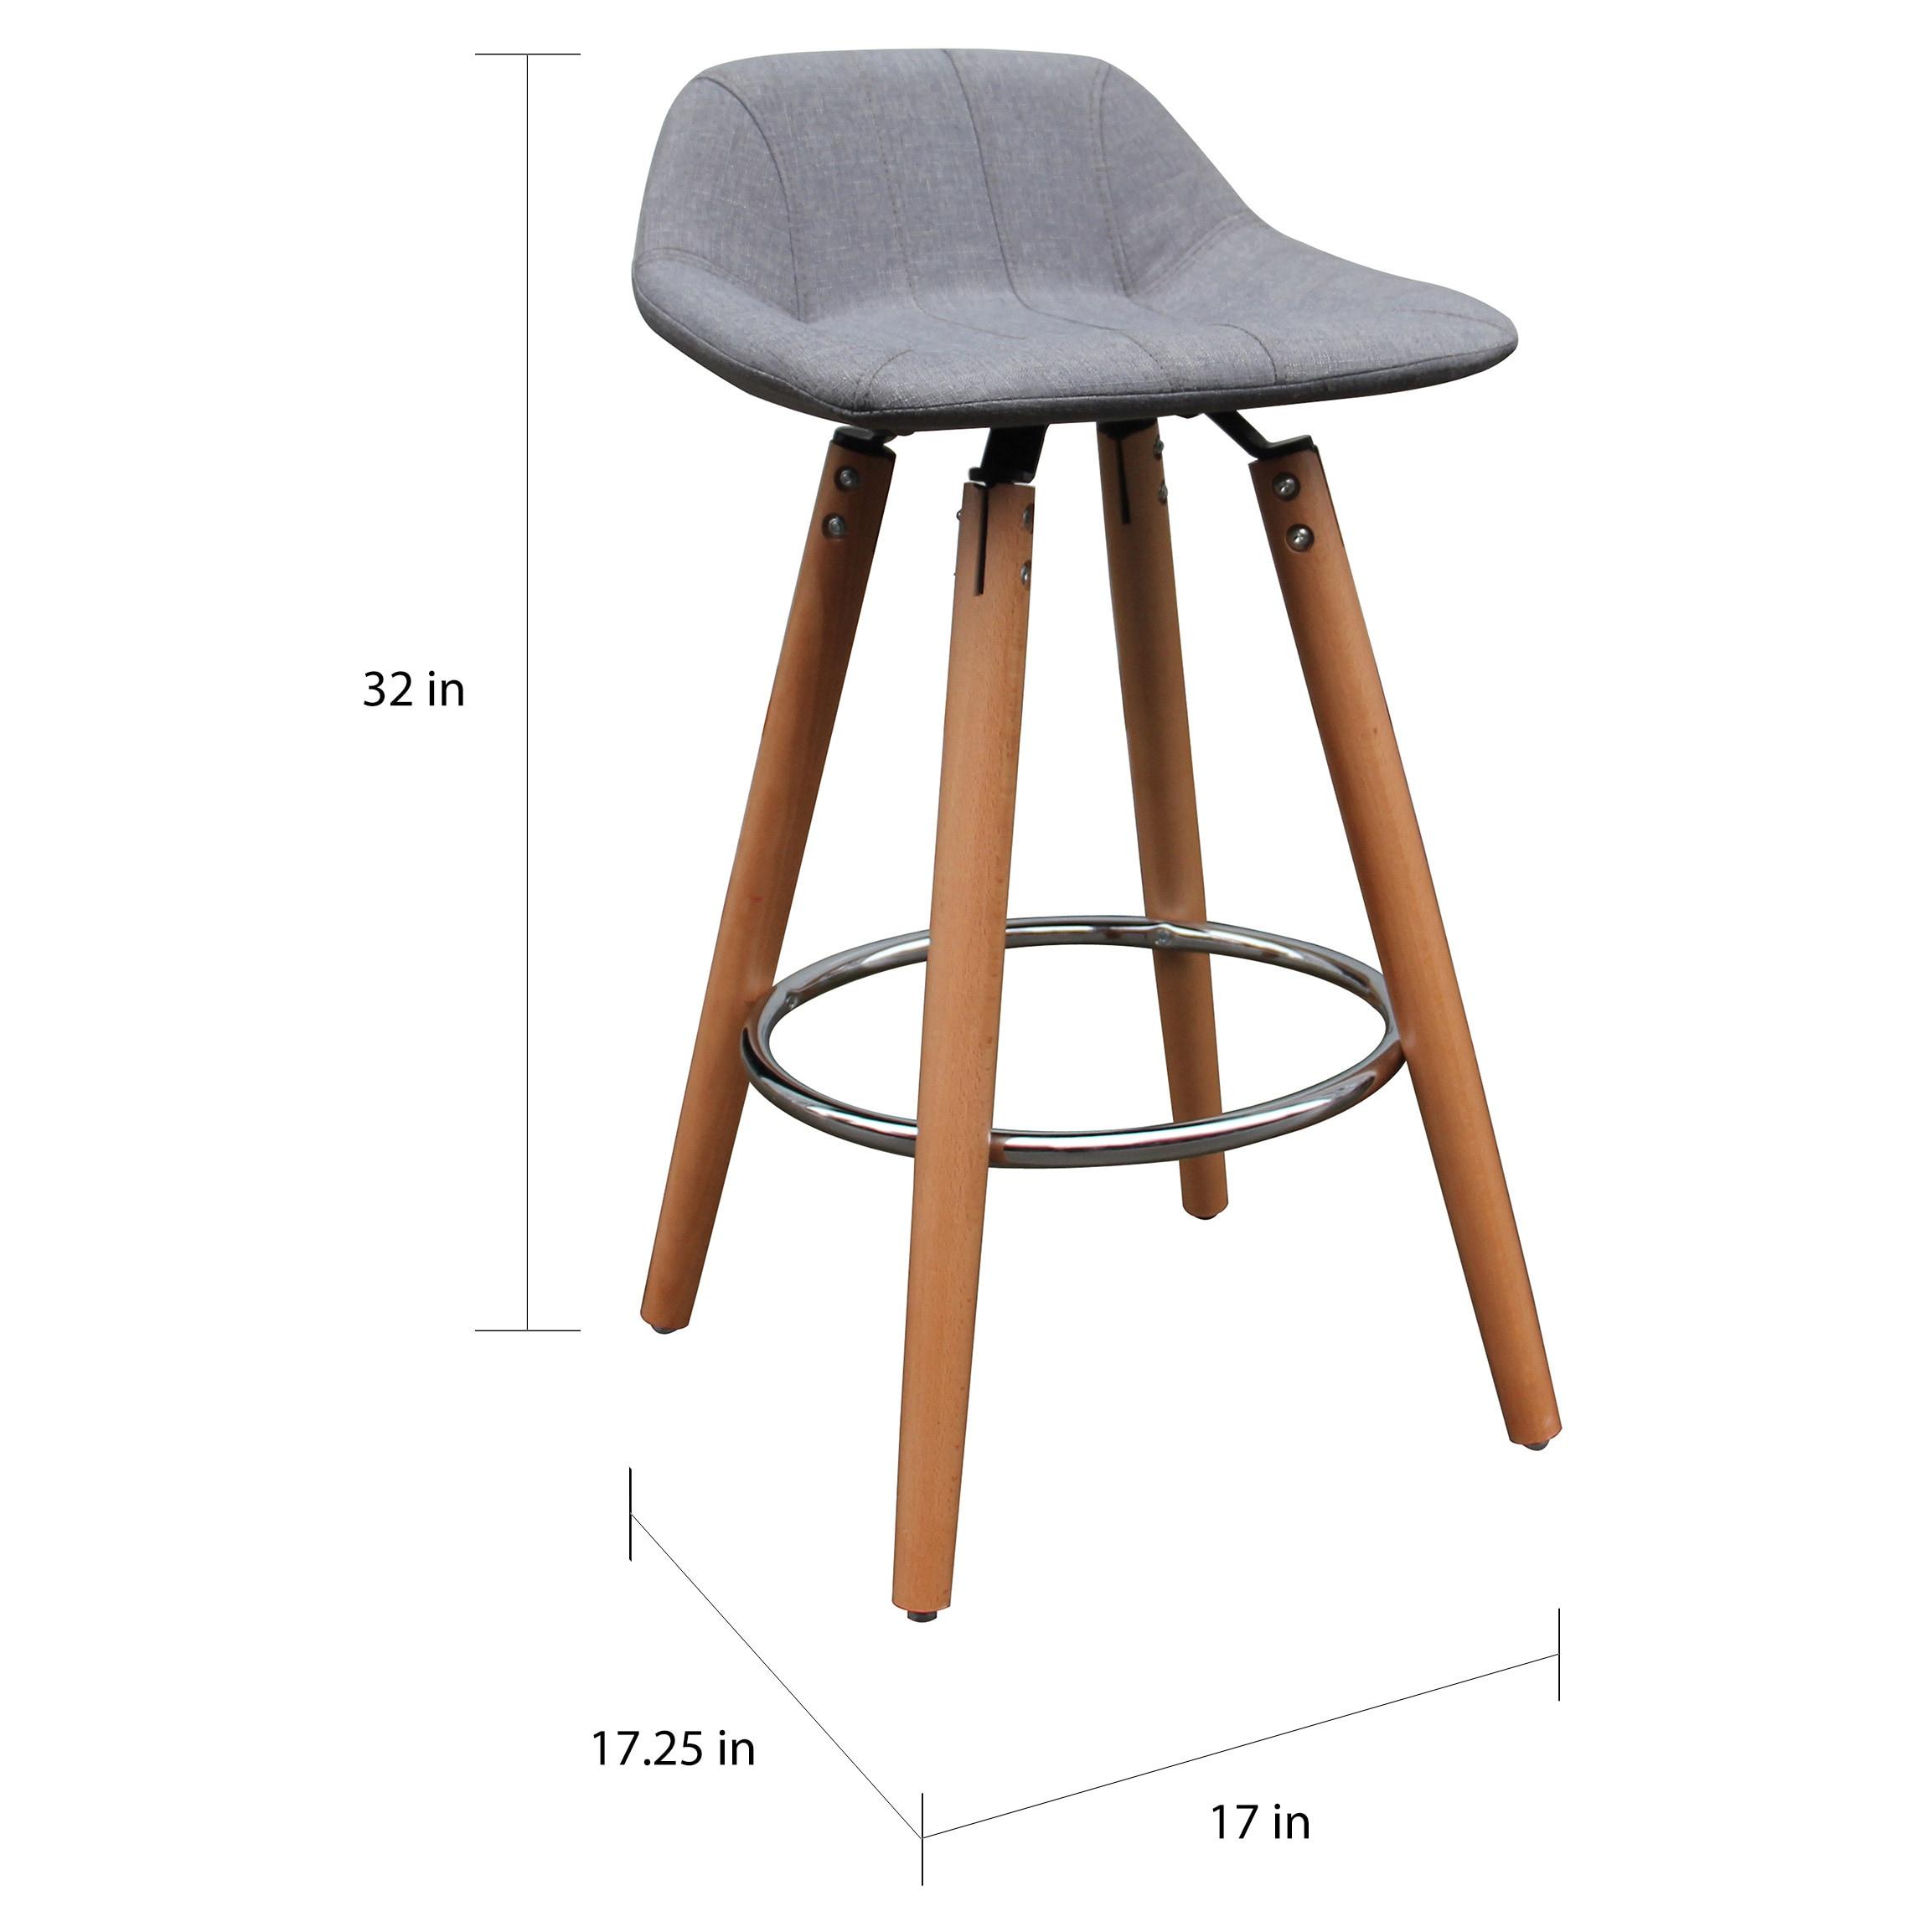 Super Camaro 26 Inch Counter Stool Set Of 2 Evergreenethics Interior Chair Design Evergreenethicsorg